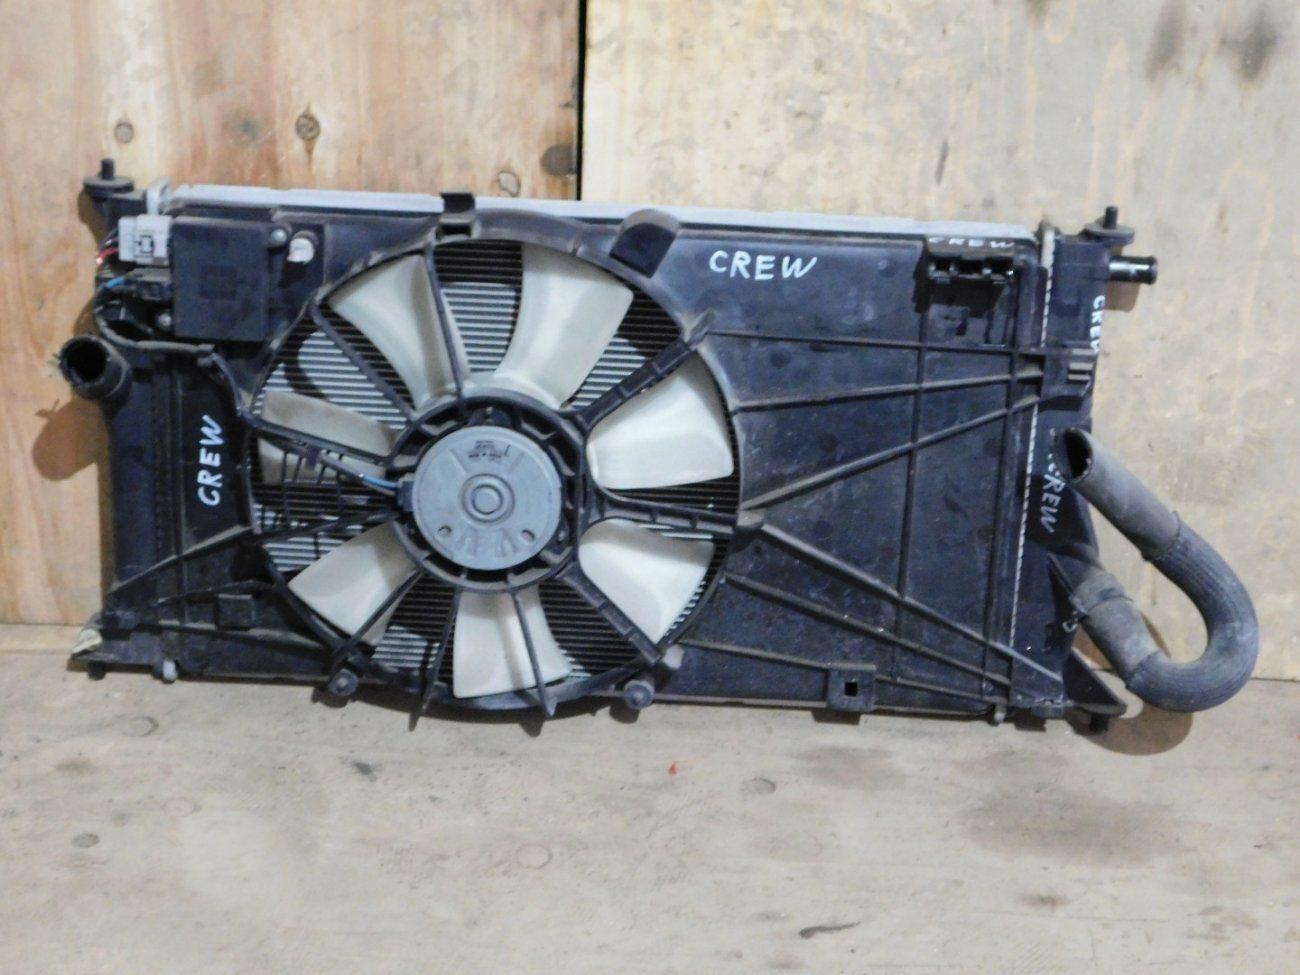 Радиатор основной Mazda Premacy CREW LF (б/у)